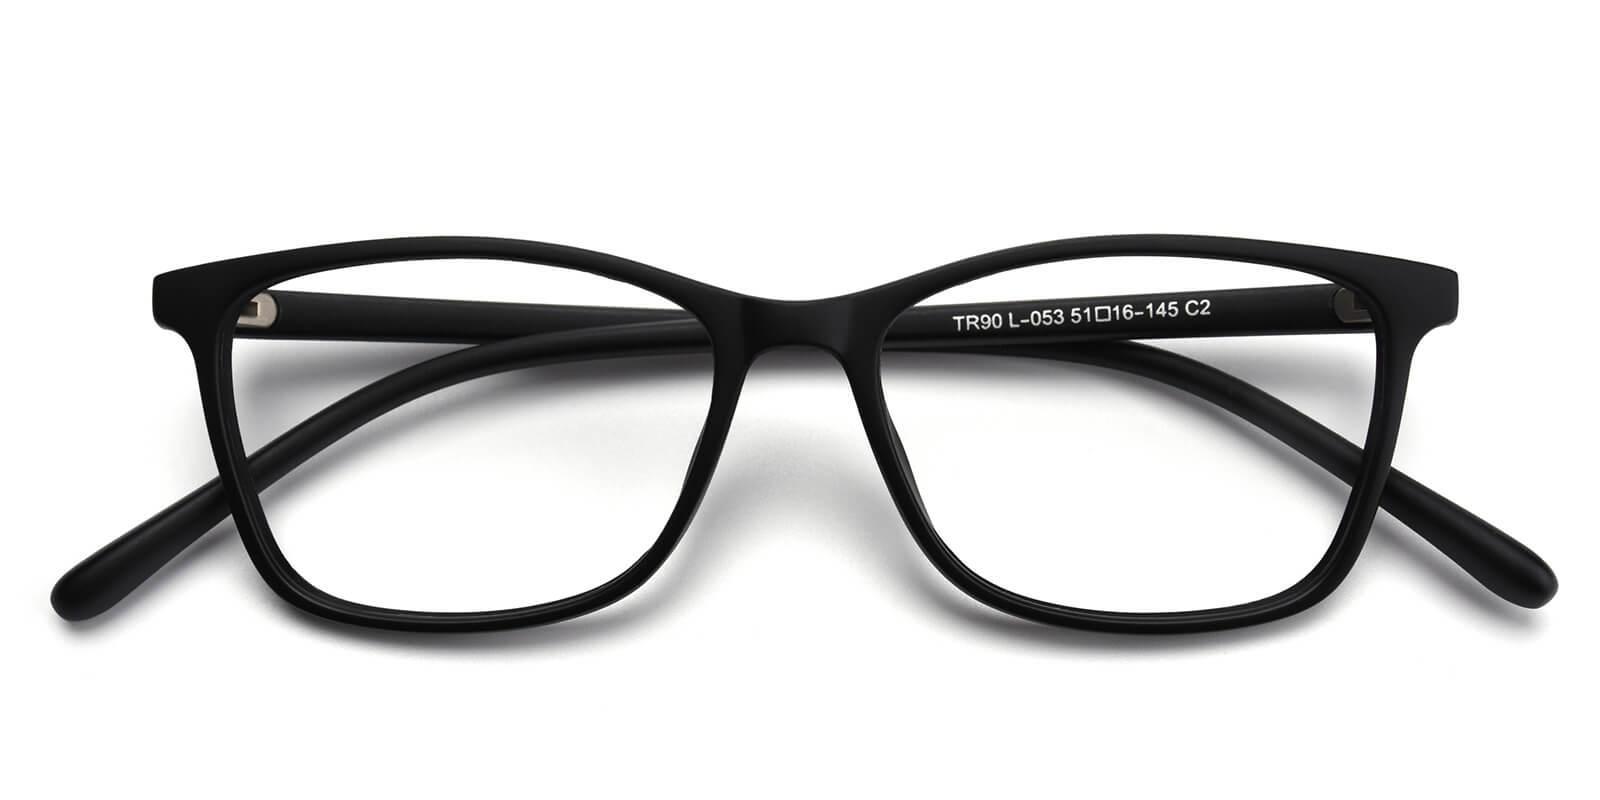 Suofia-Black-Cat-TR-Eyeglasses-detail